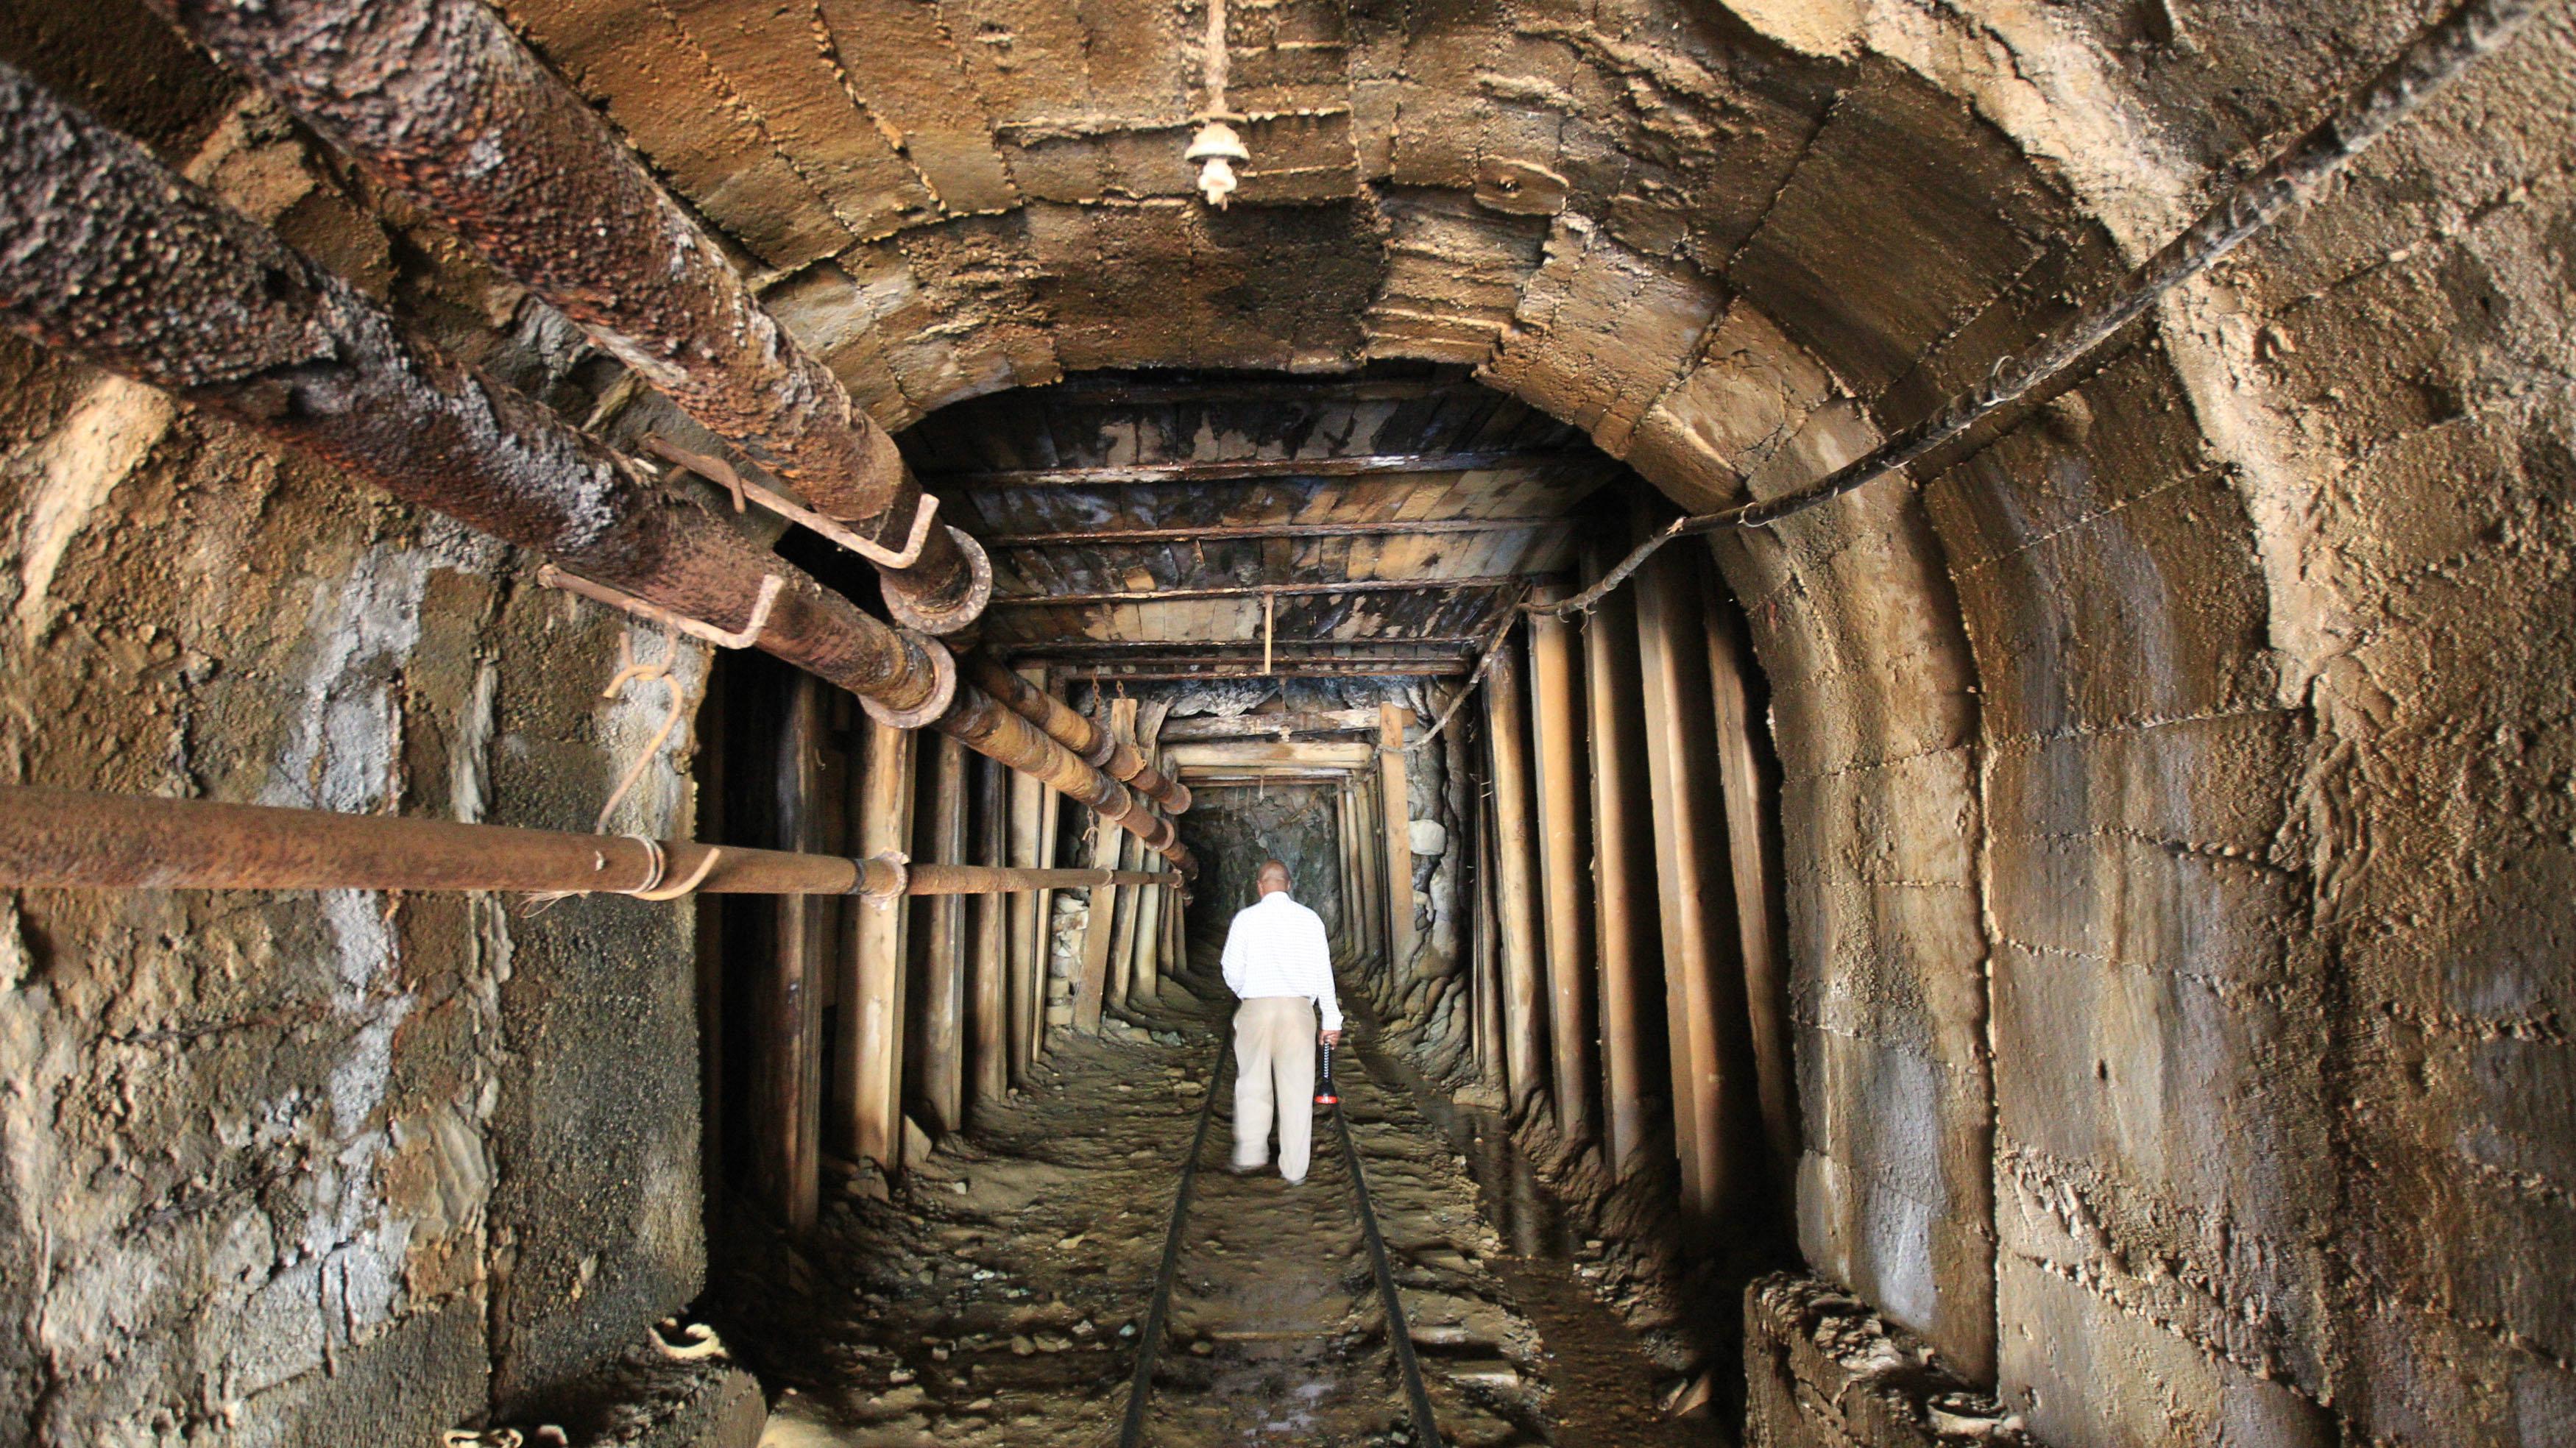 The Kilembe copper-cobalt mine.